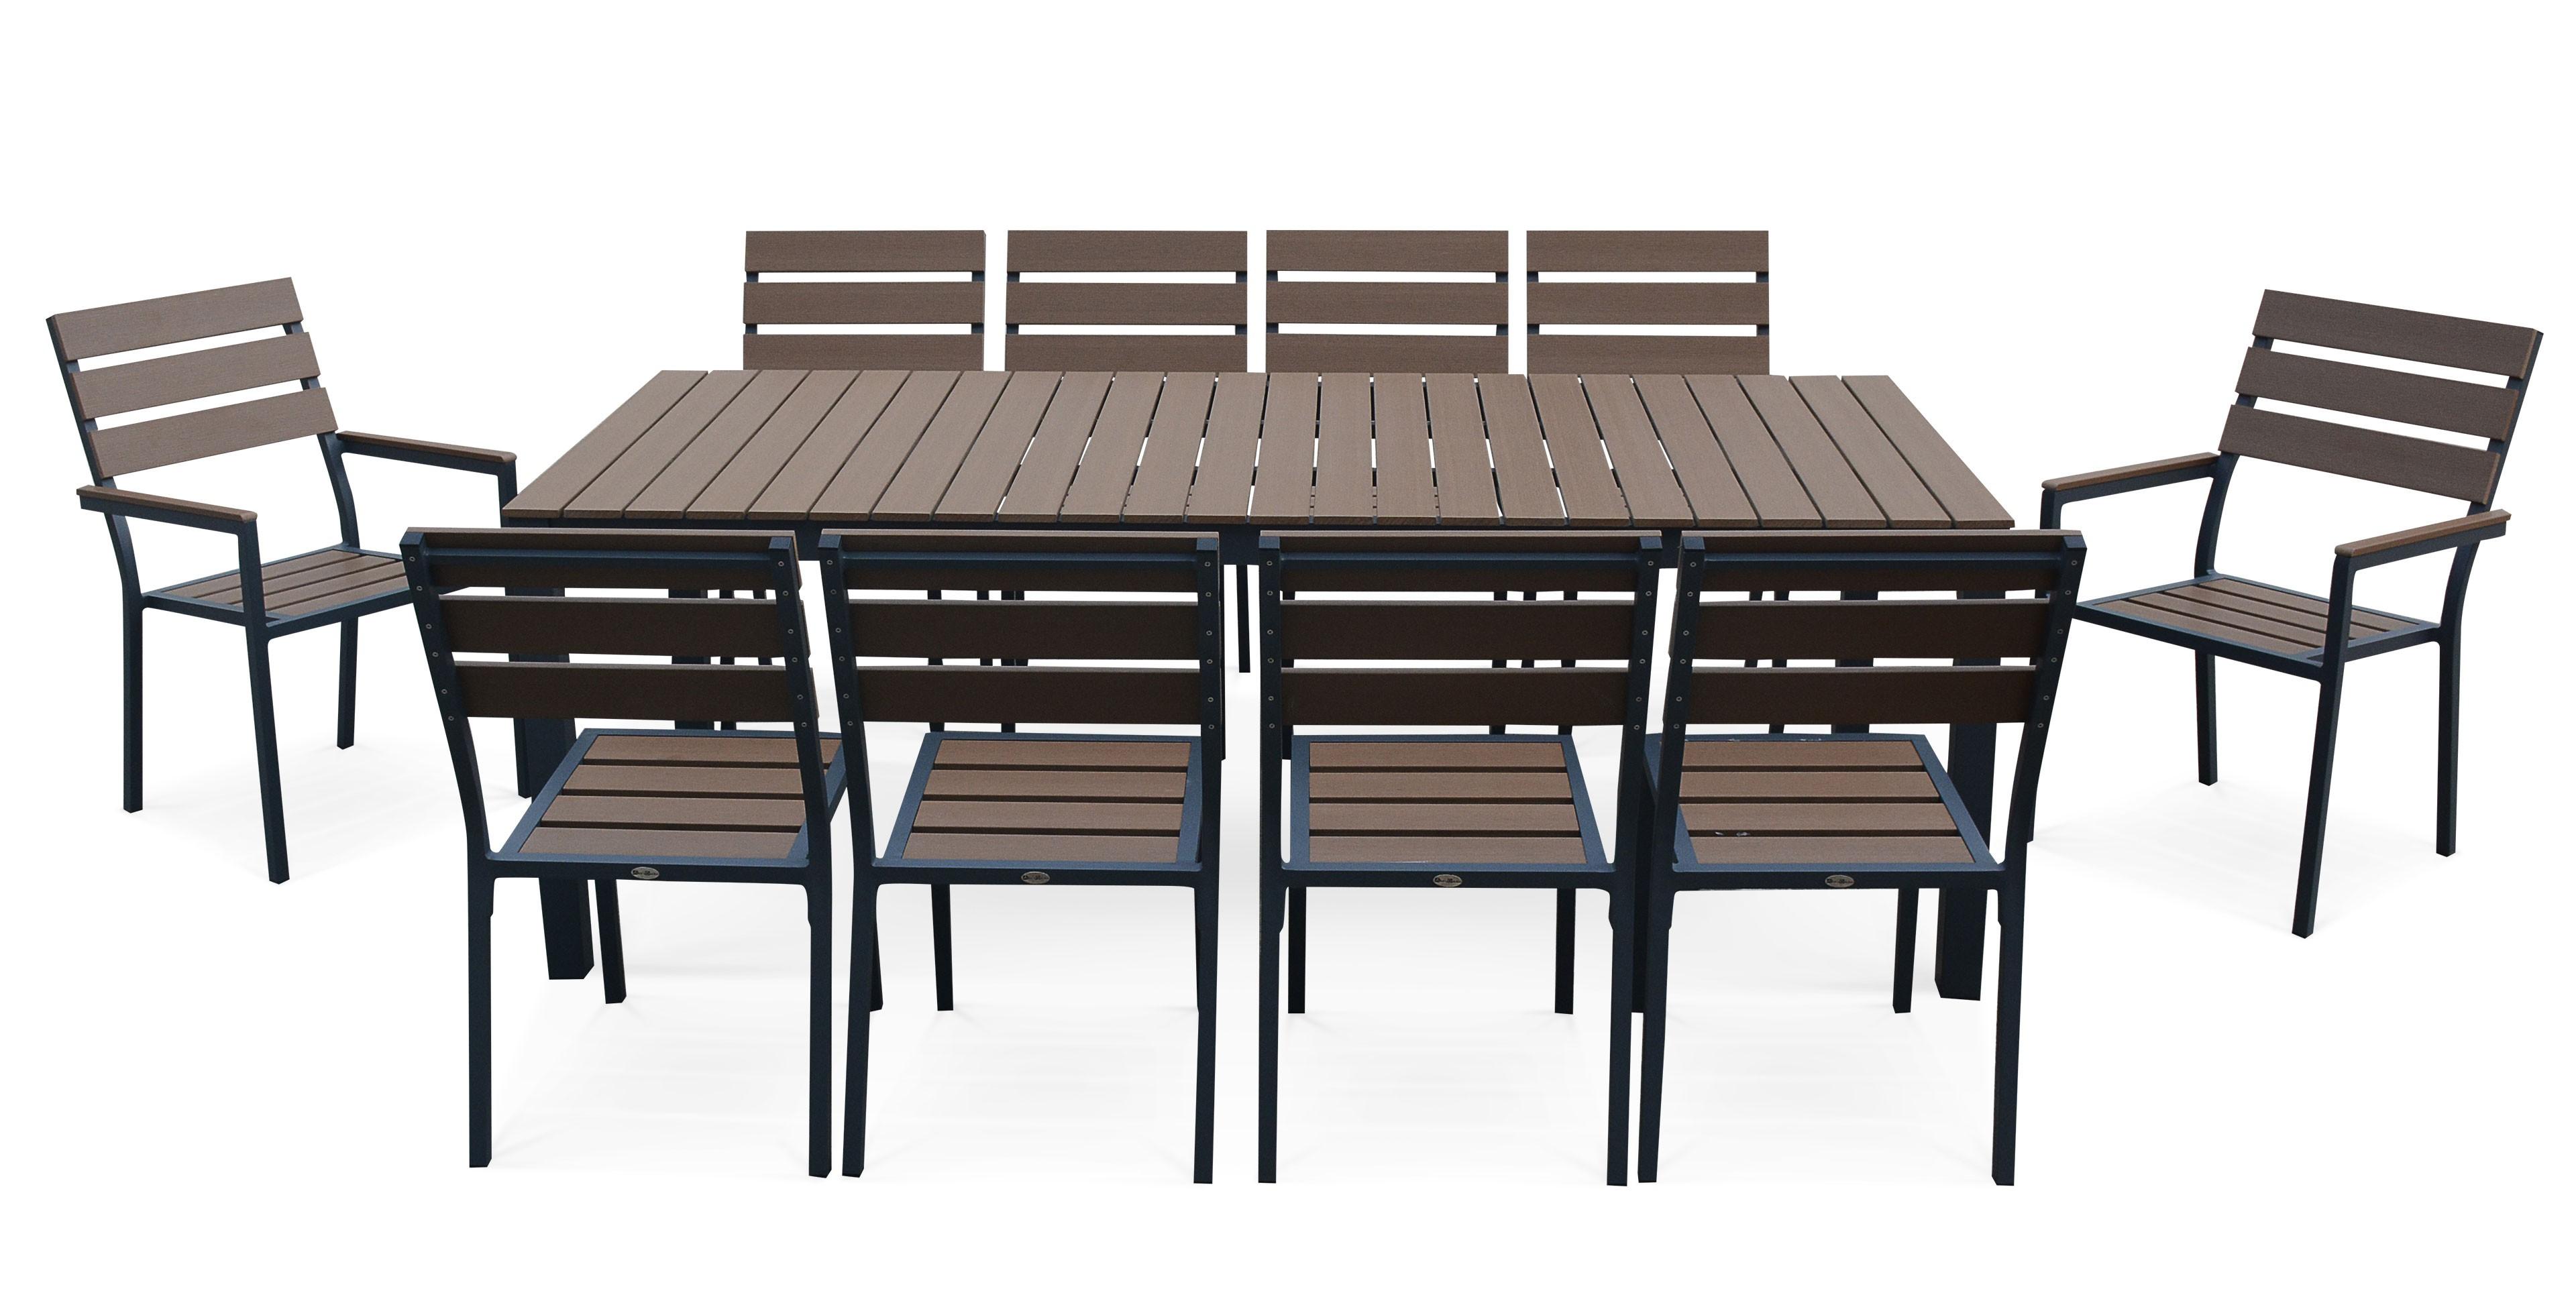 Beau Table Jardin 10 Personnes Et Salon De Jardin Polywood dedans Table De Jardin 10 Personnes